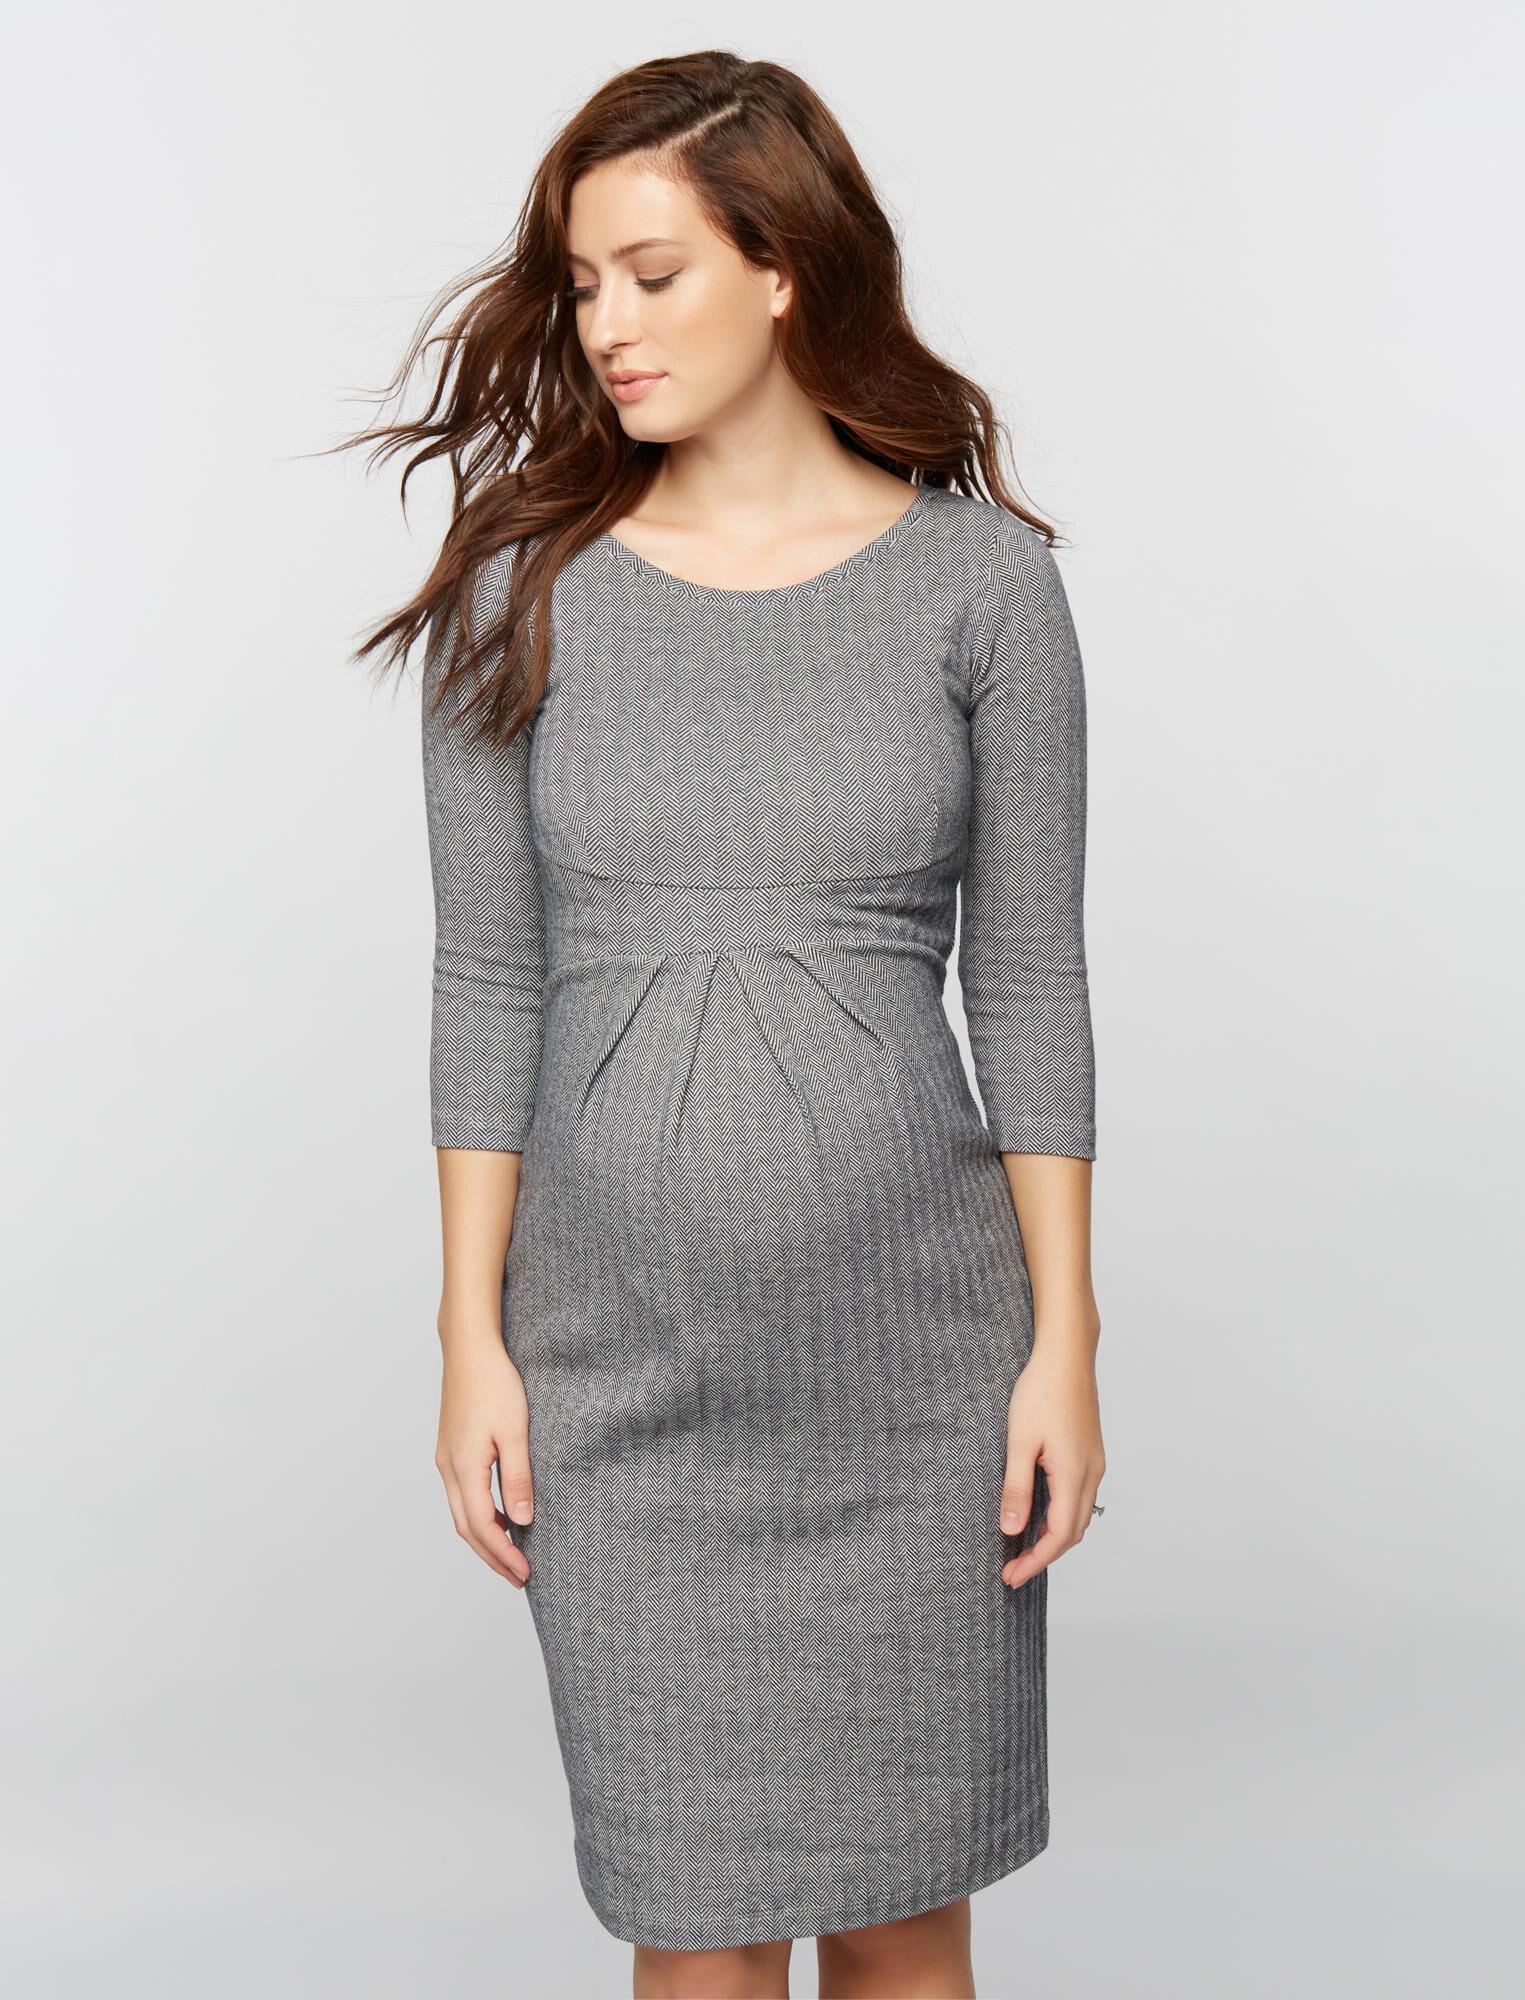 Isabella Oliver Shirring Detail Maternity Dress